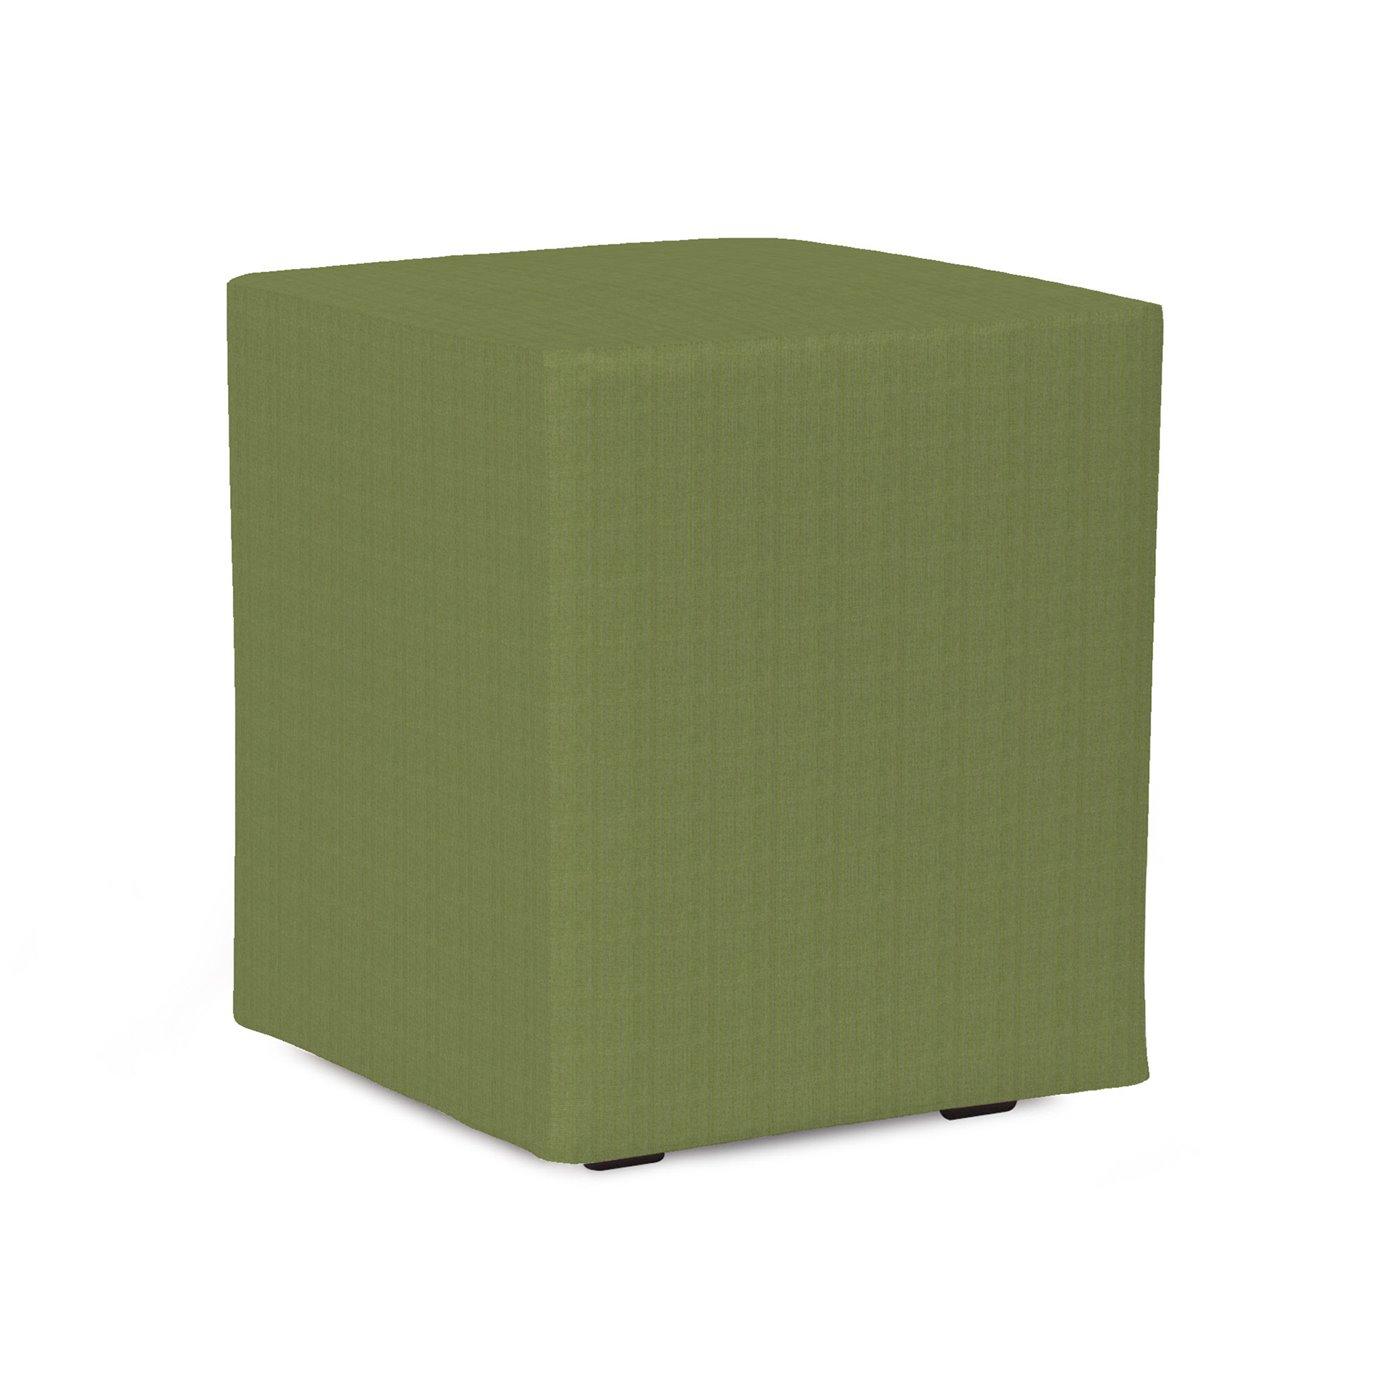 Howard Elliott Universal Cube Outdoor Sunbrella Seascape Moss Complete Ottoman